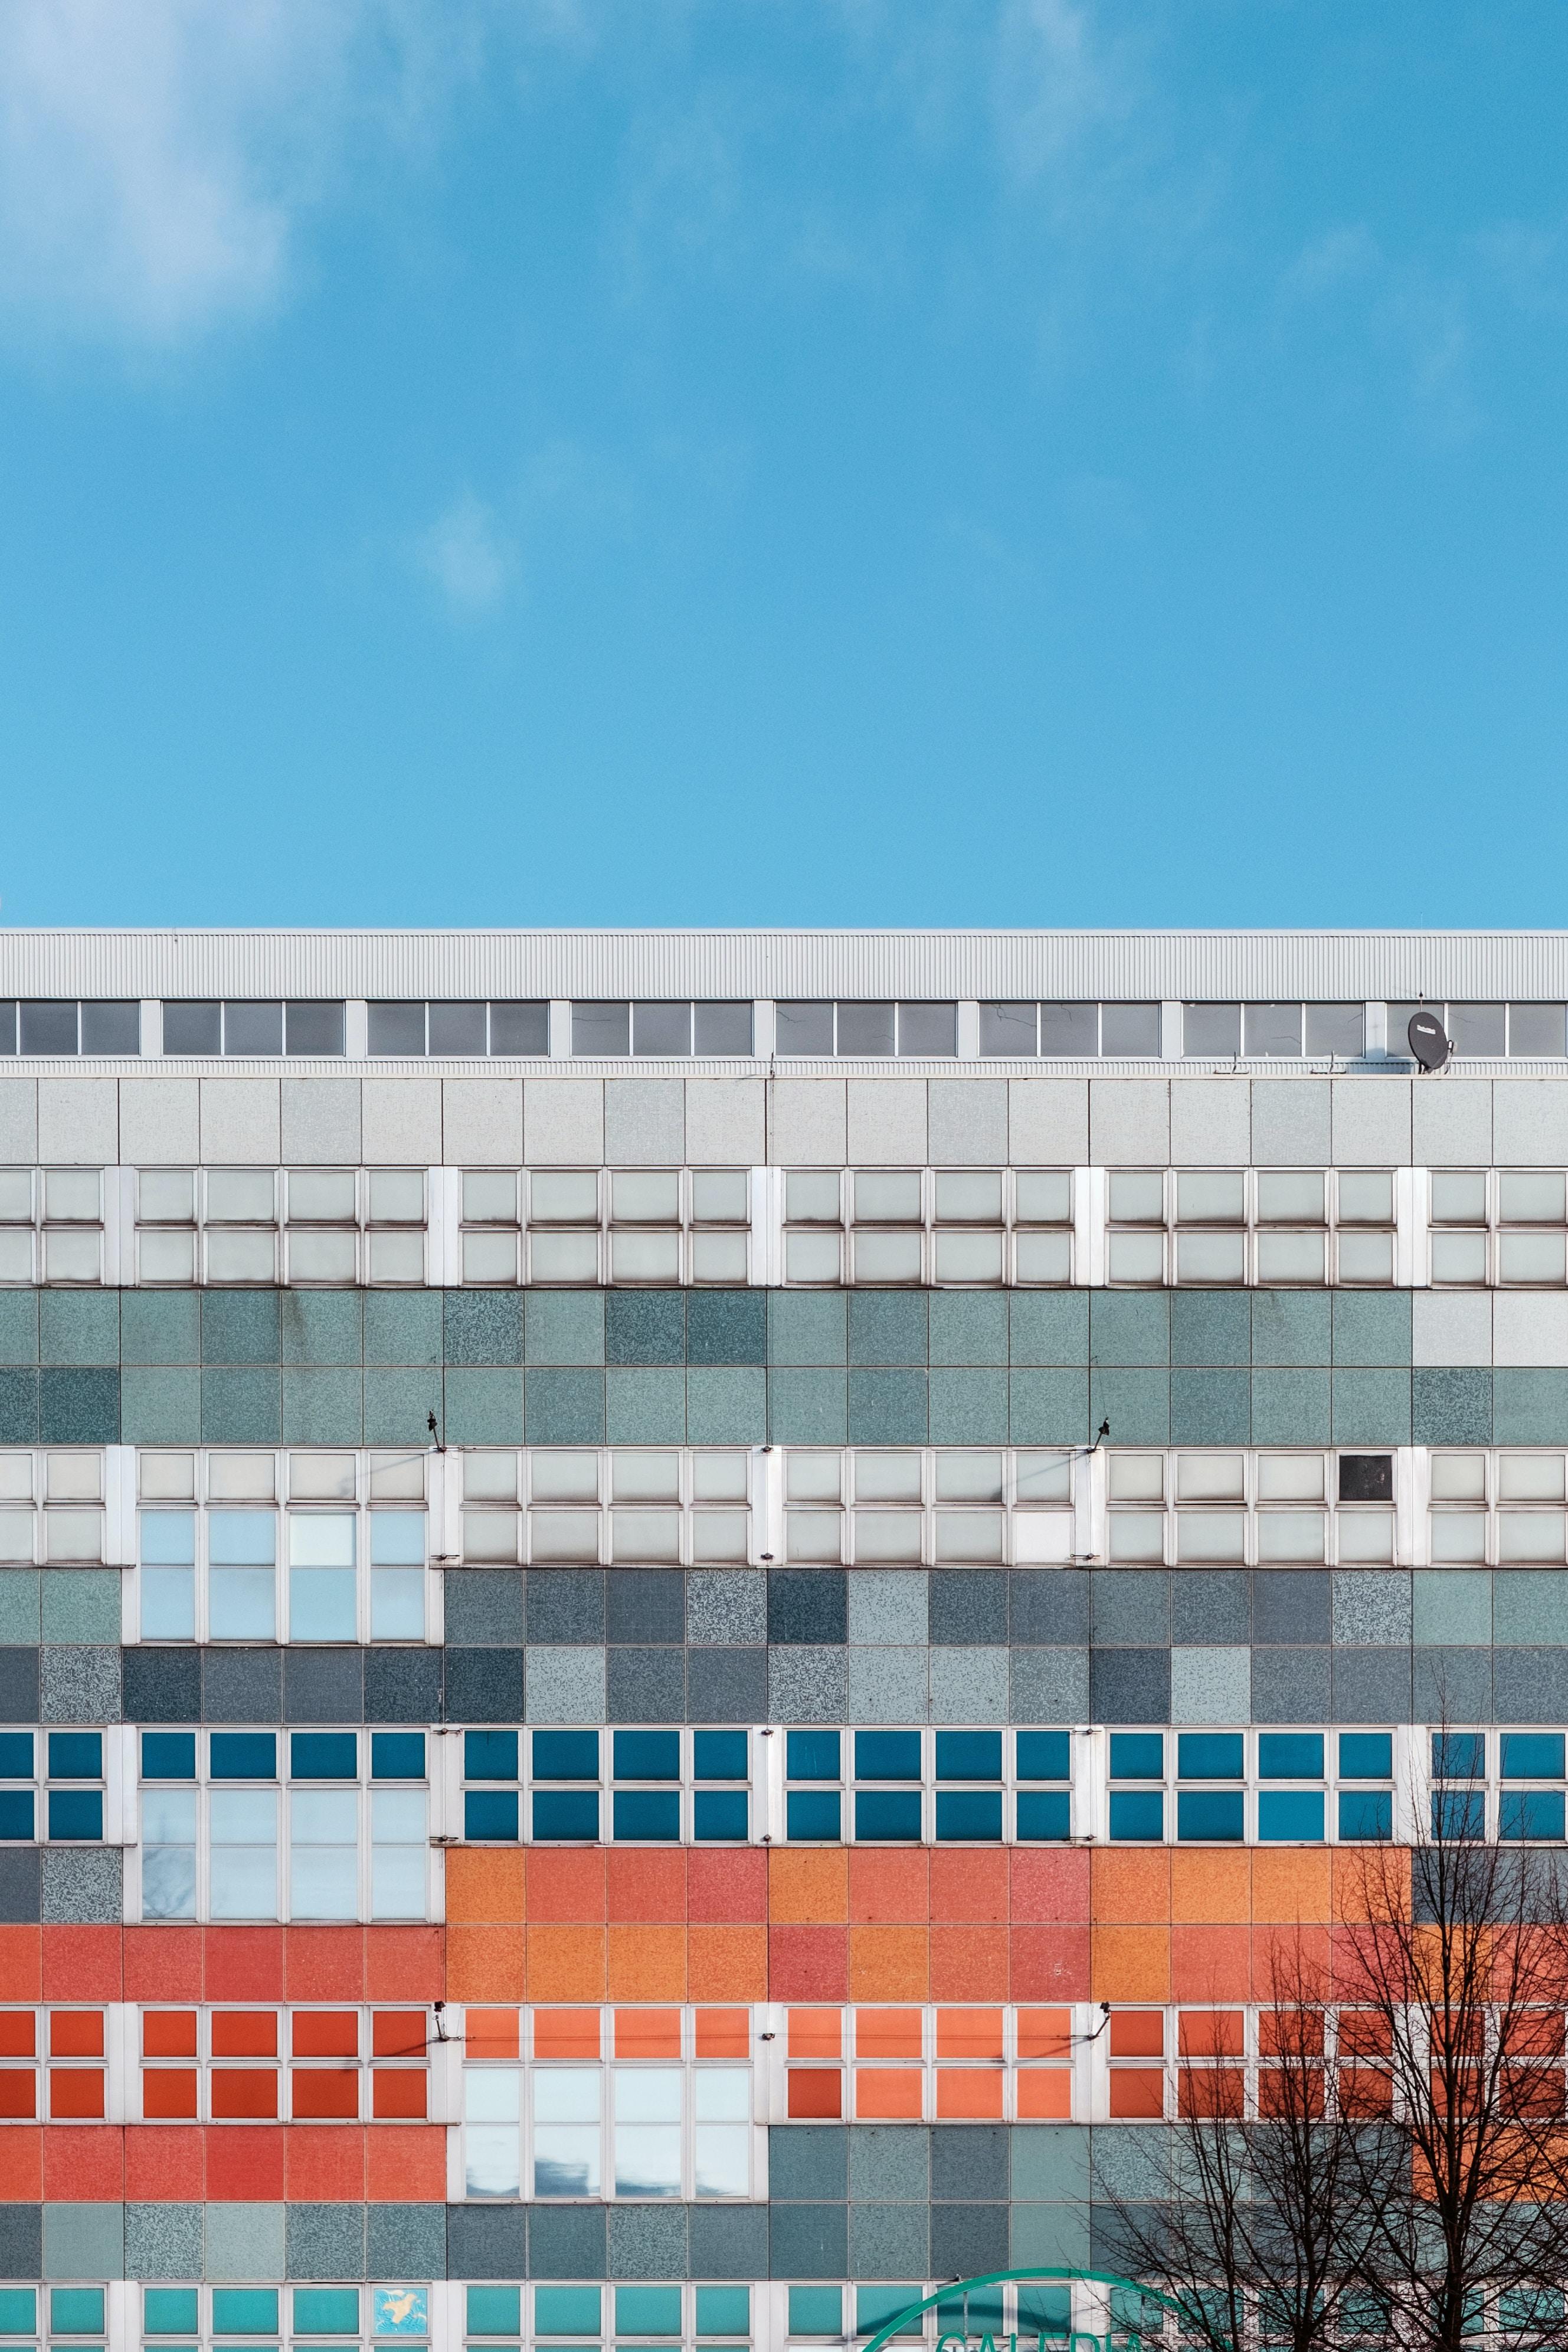 multicolored window building